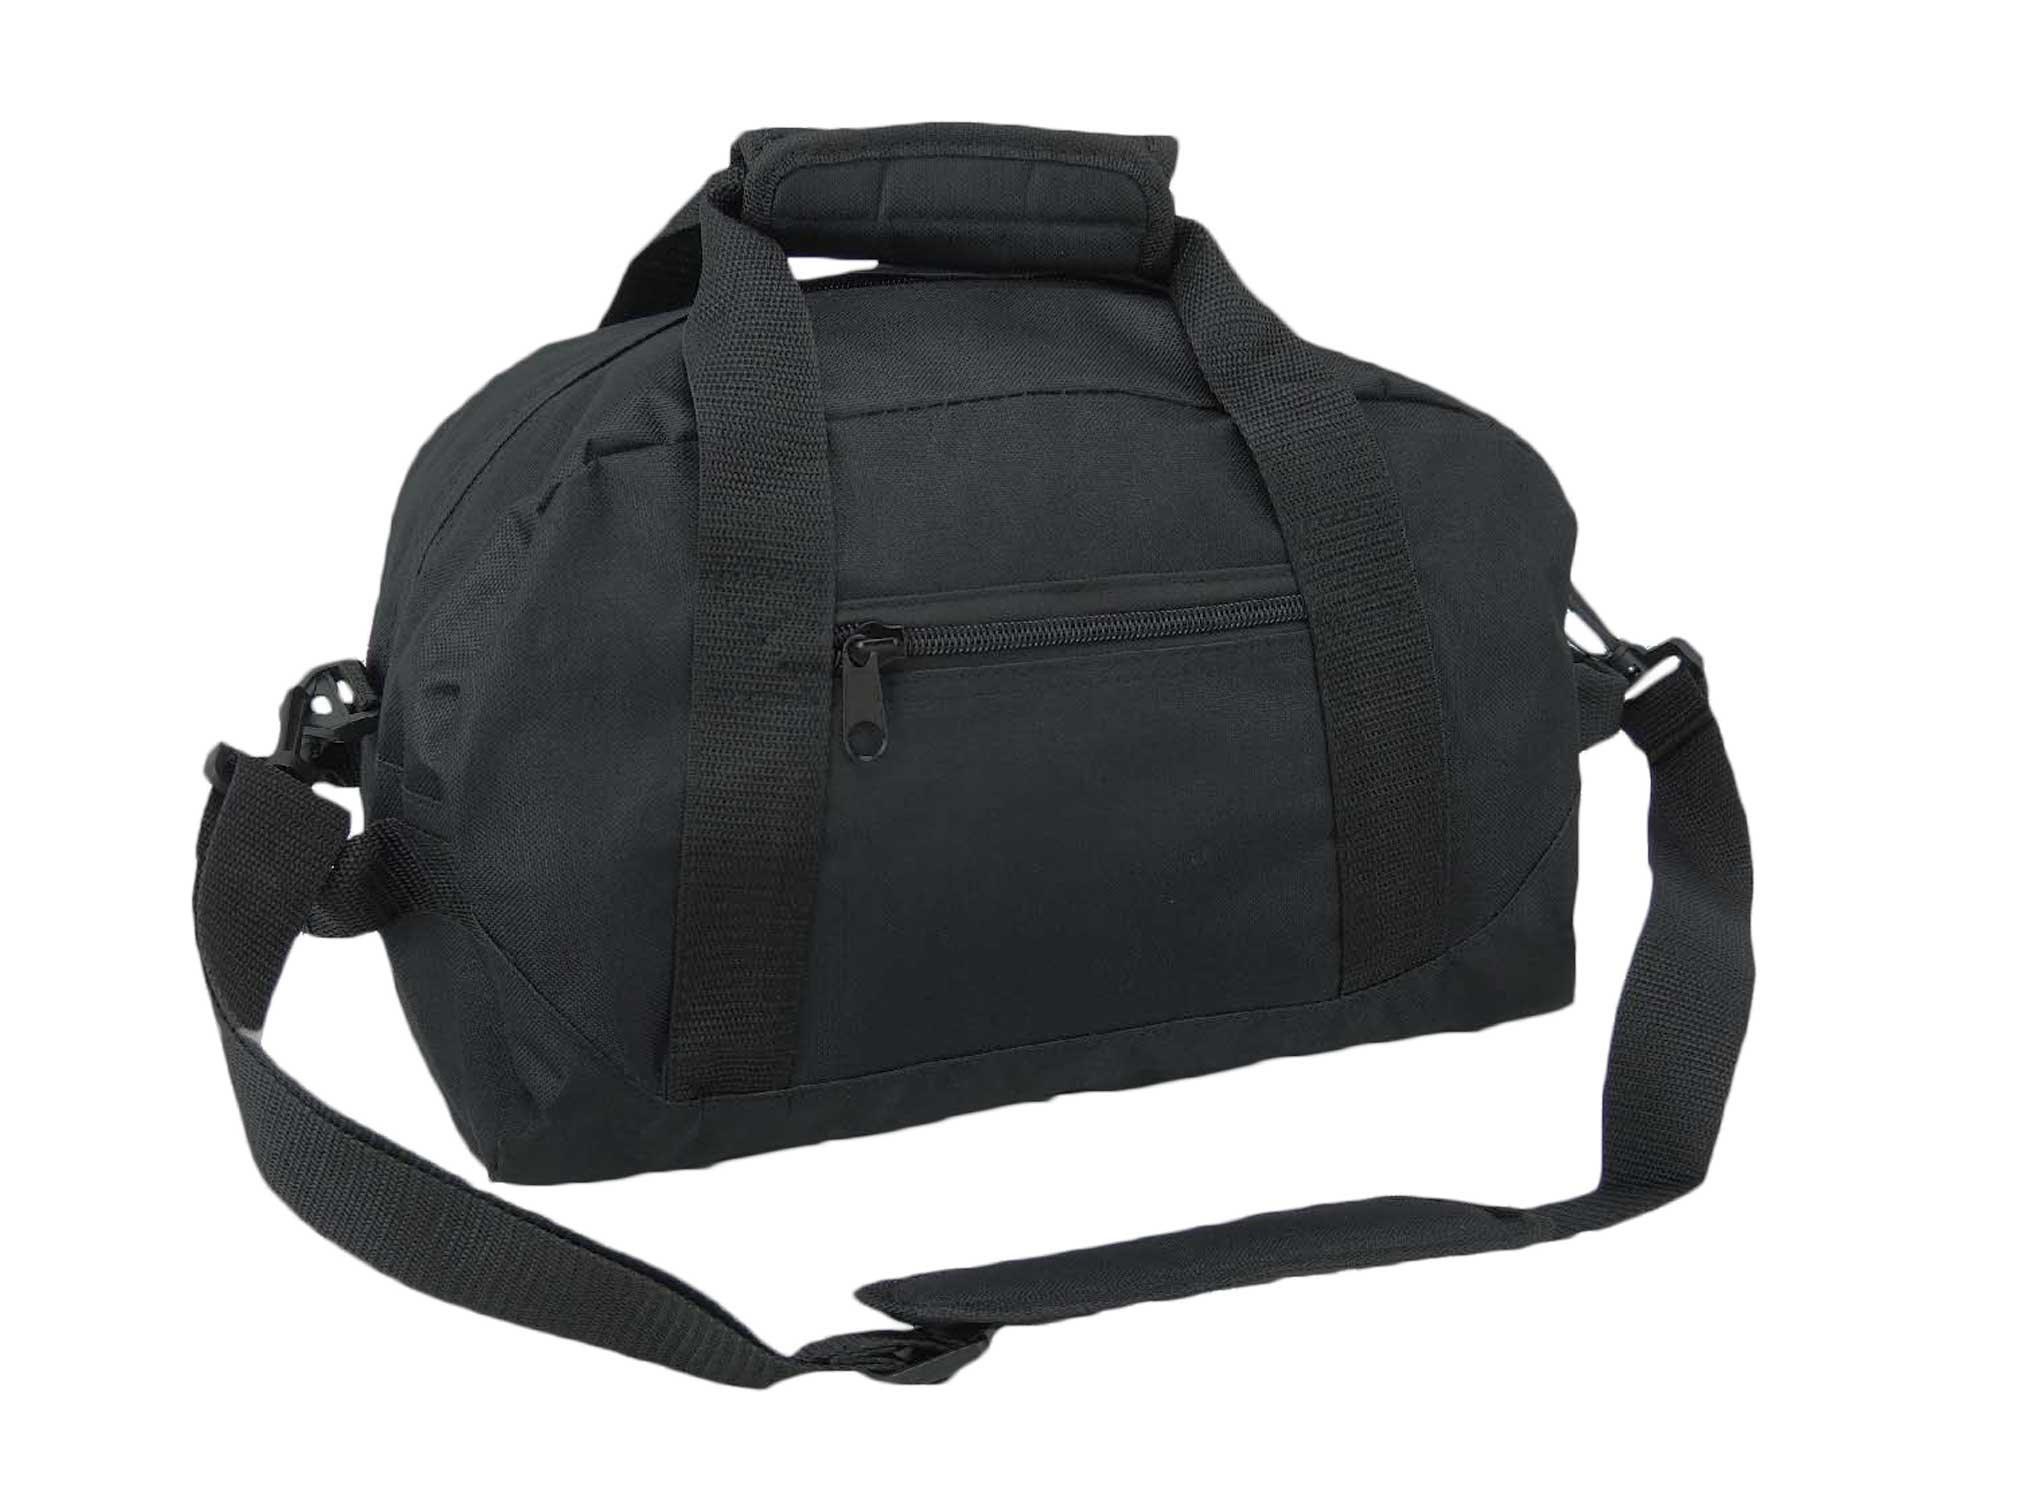 DALIX 14'' Small Duffle Bag Two Toned Gym Travel Bag (Black) by DALIX